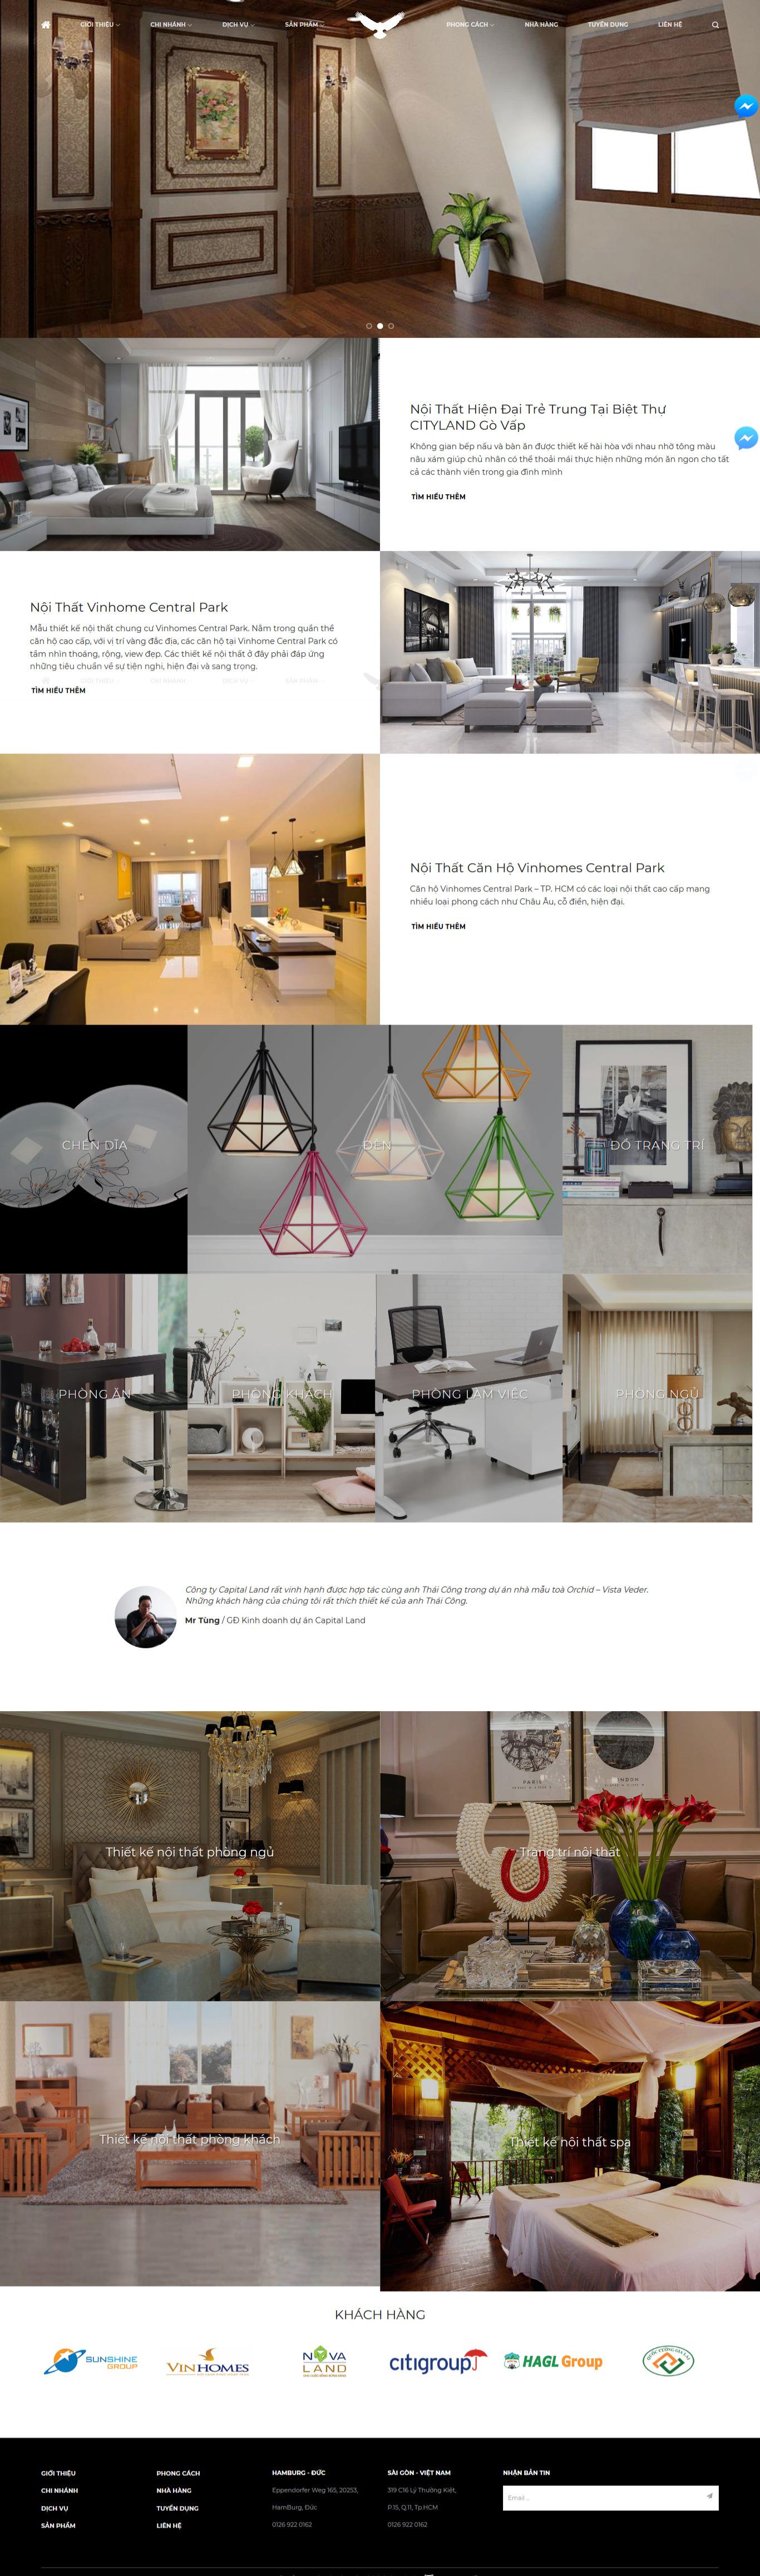 Mẫu website thiết kế nội thất kiến trúc sư